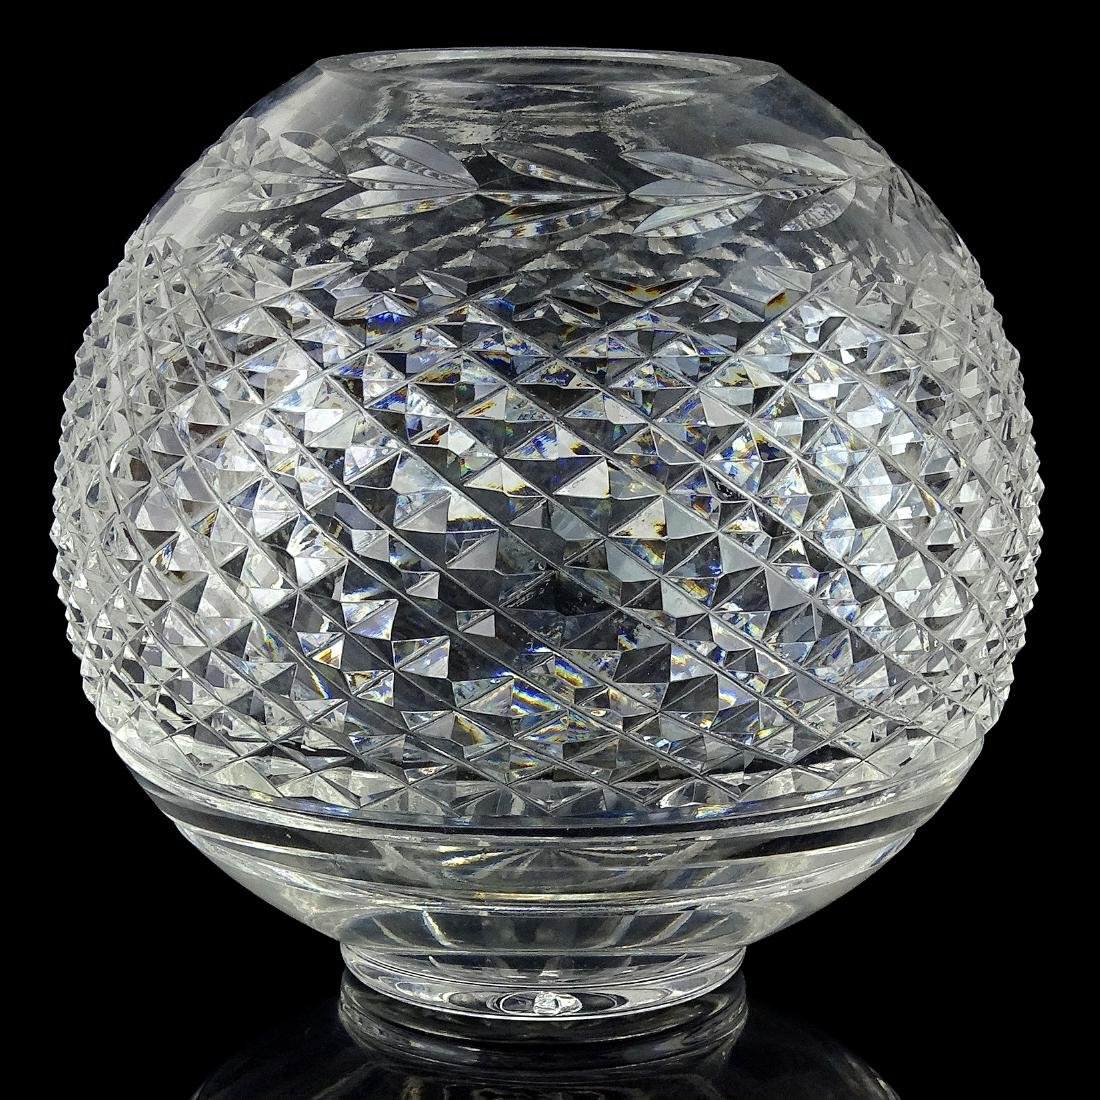 Brilliant Crystal Style Diamond Pattern Flower Vase